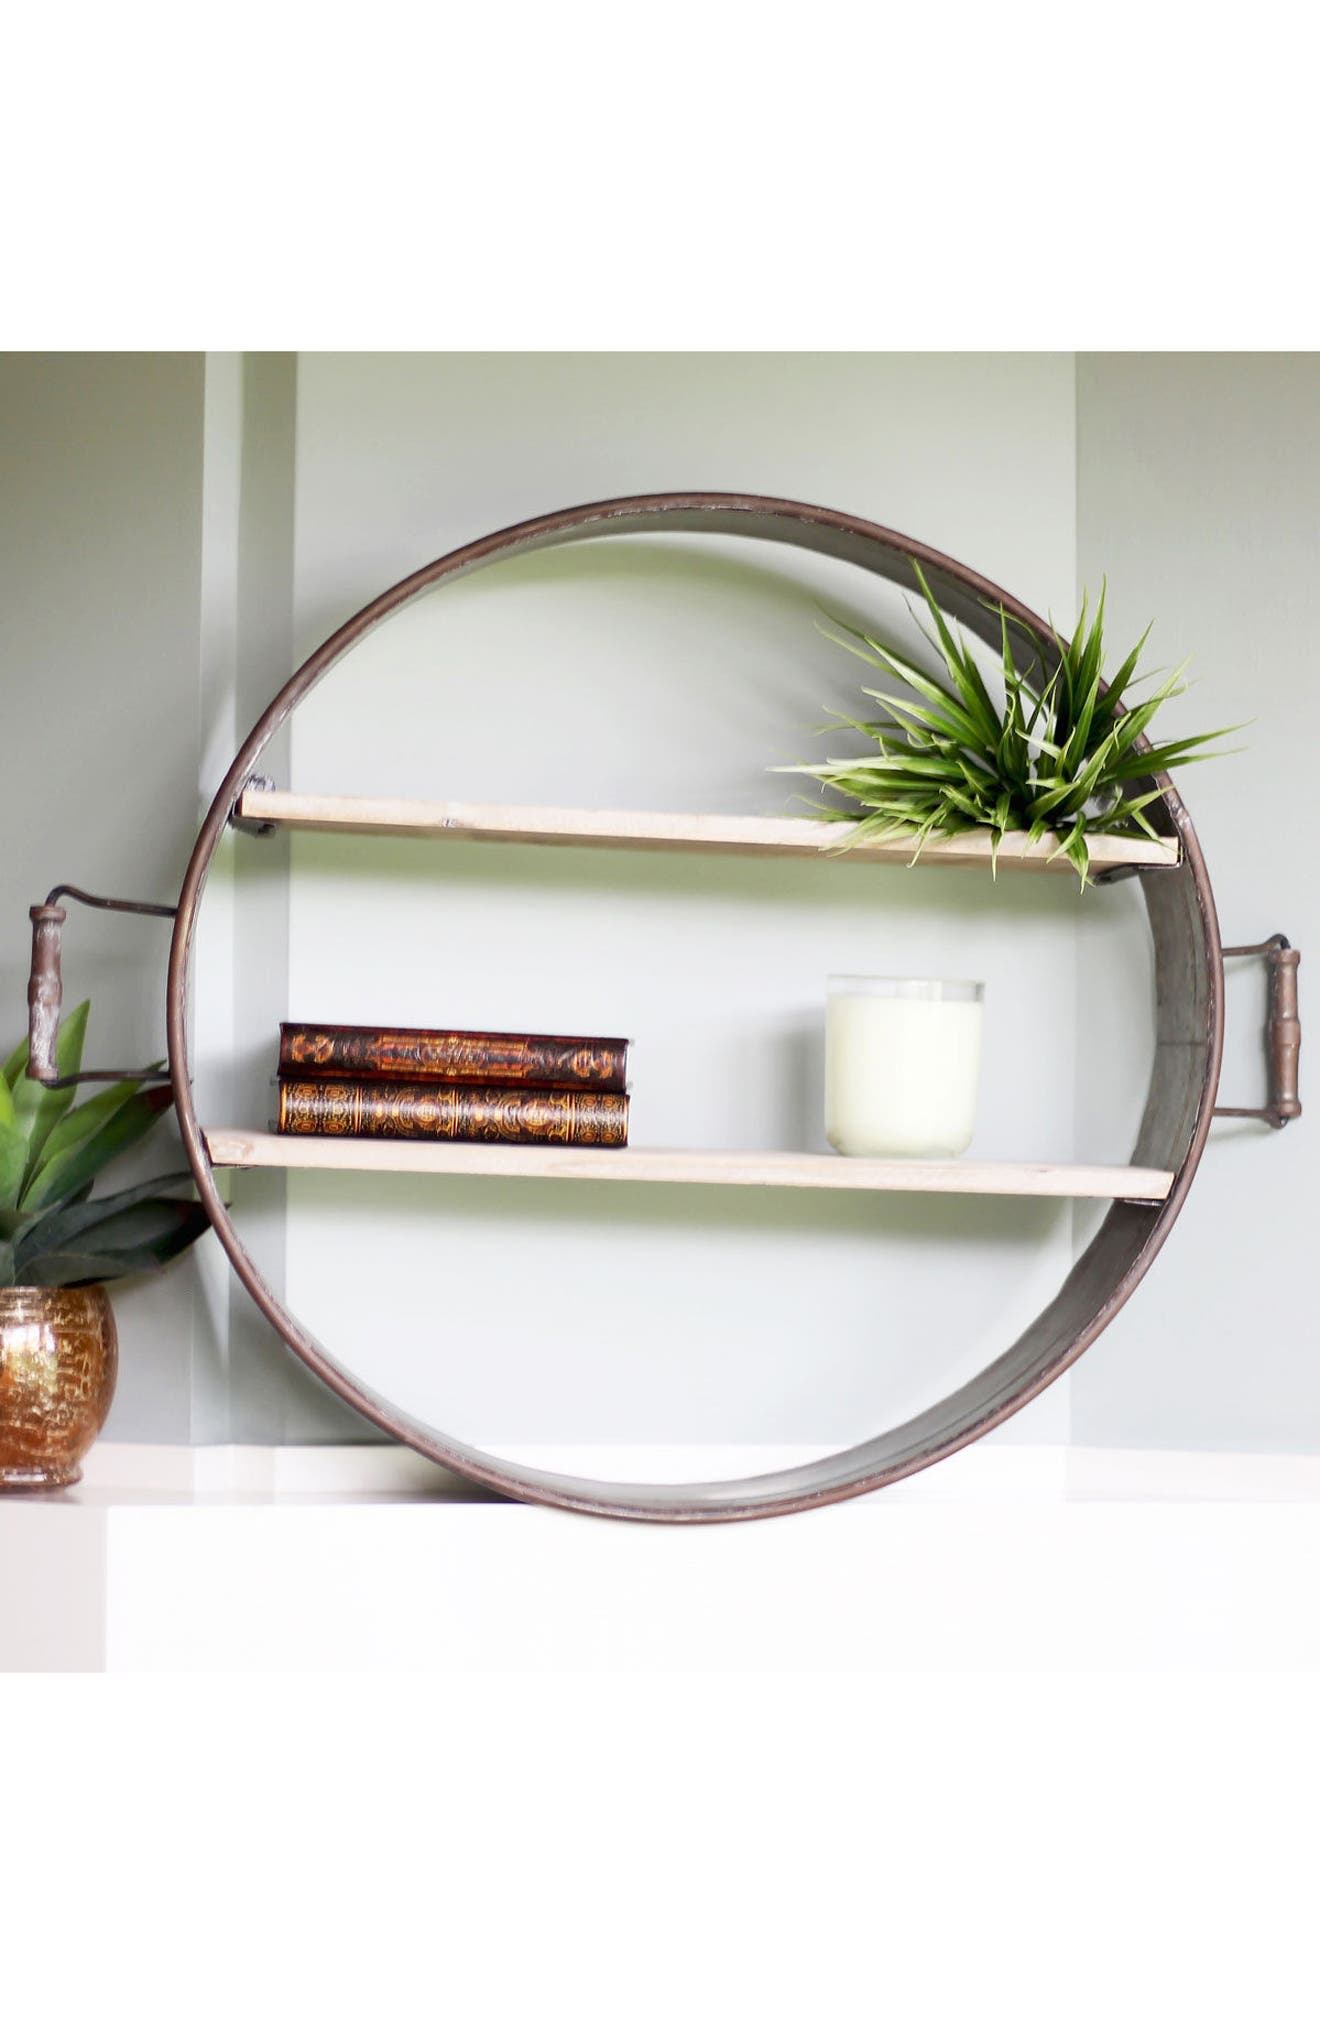 Brimfield Round Shelf,                             Alternate thumbnail 2, color,                             Metal/ Wood